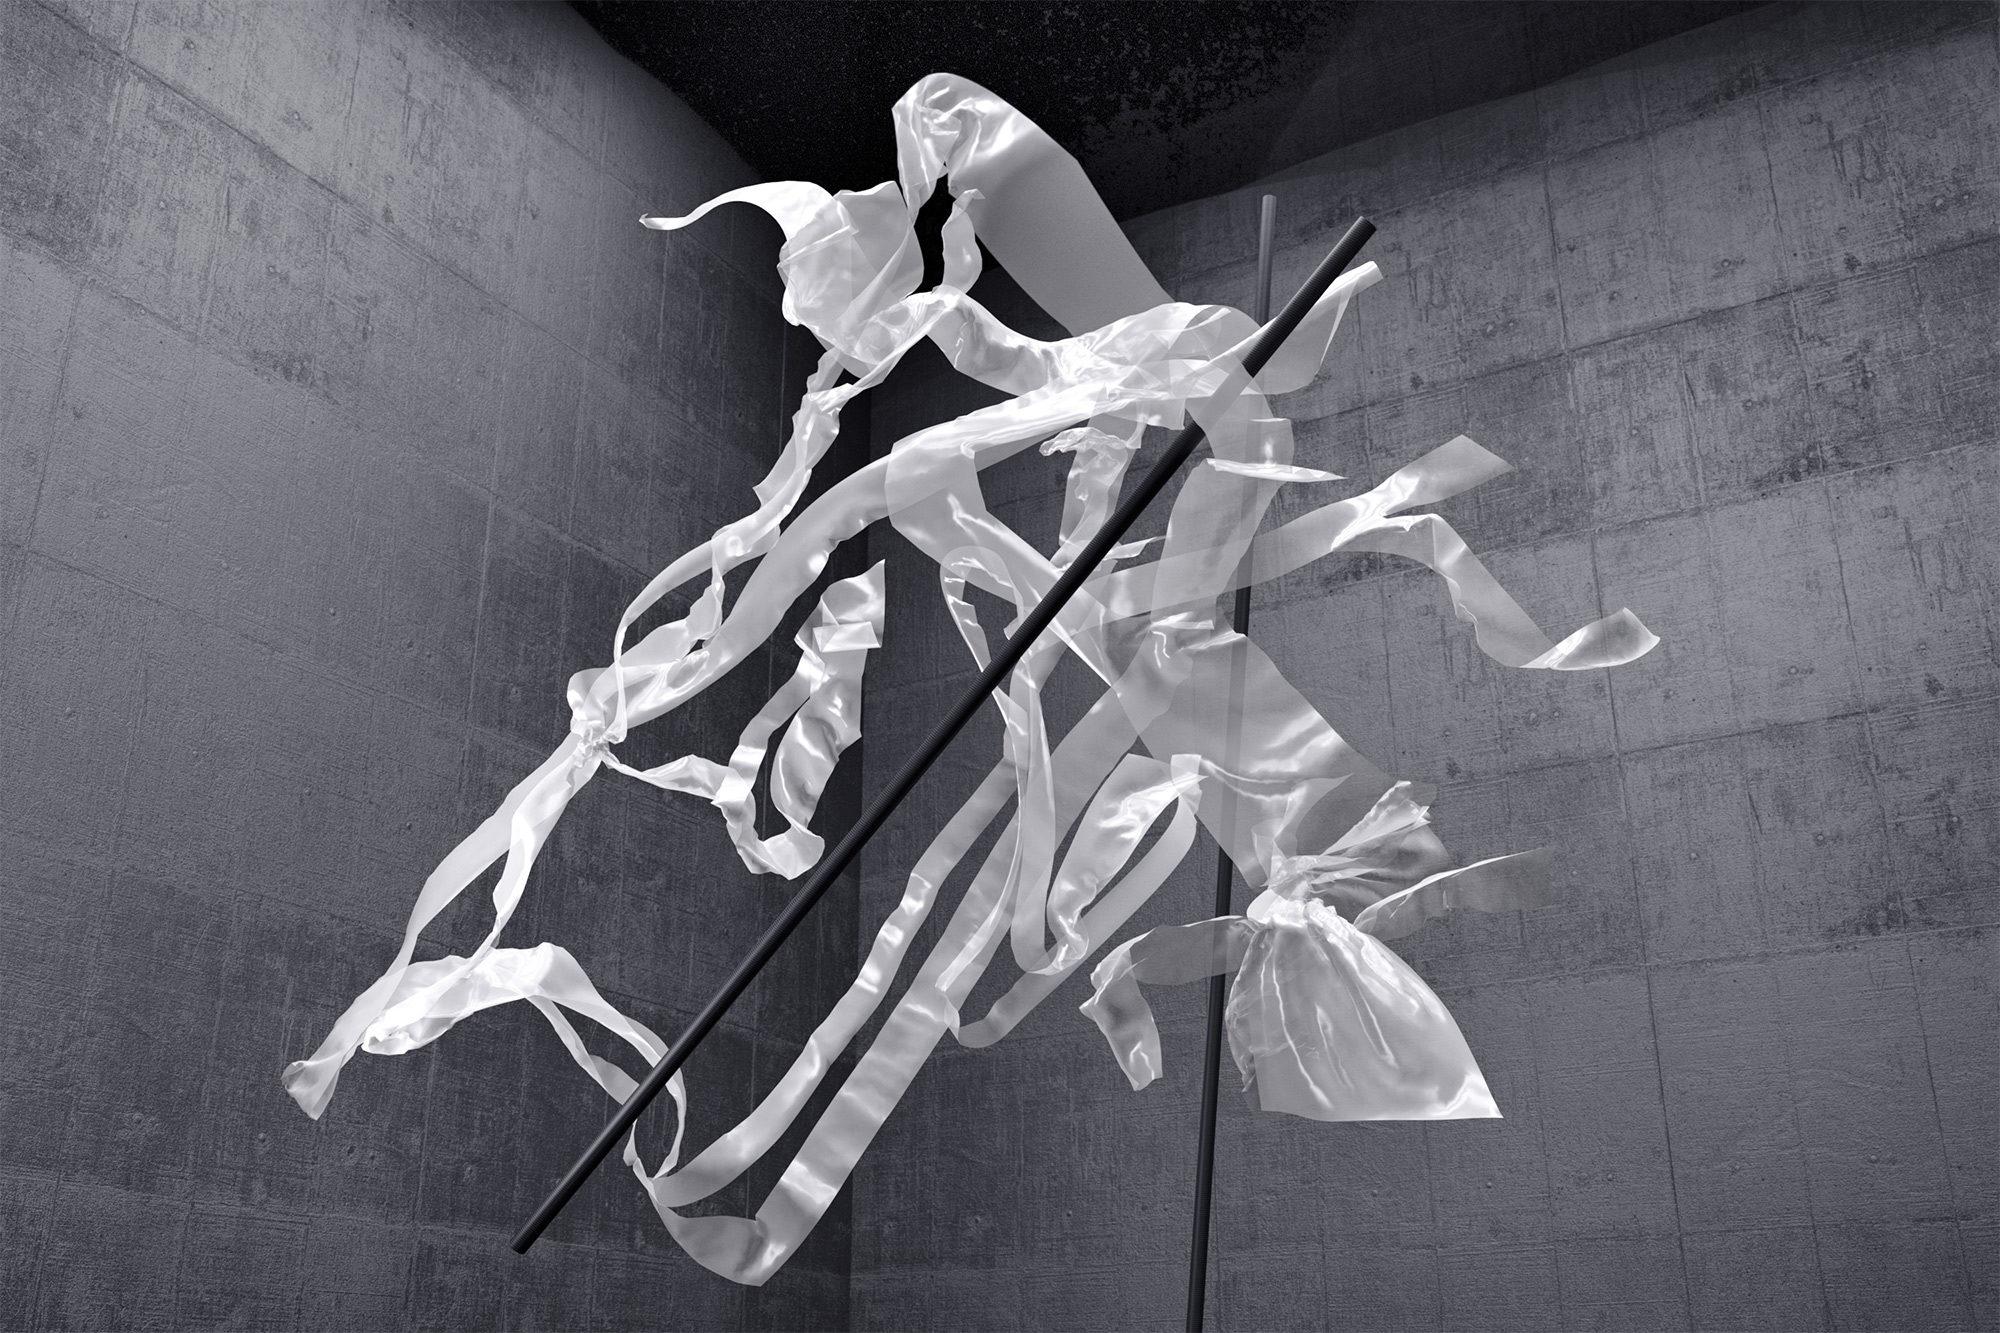 3D Rendering Stefan Eder